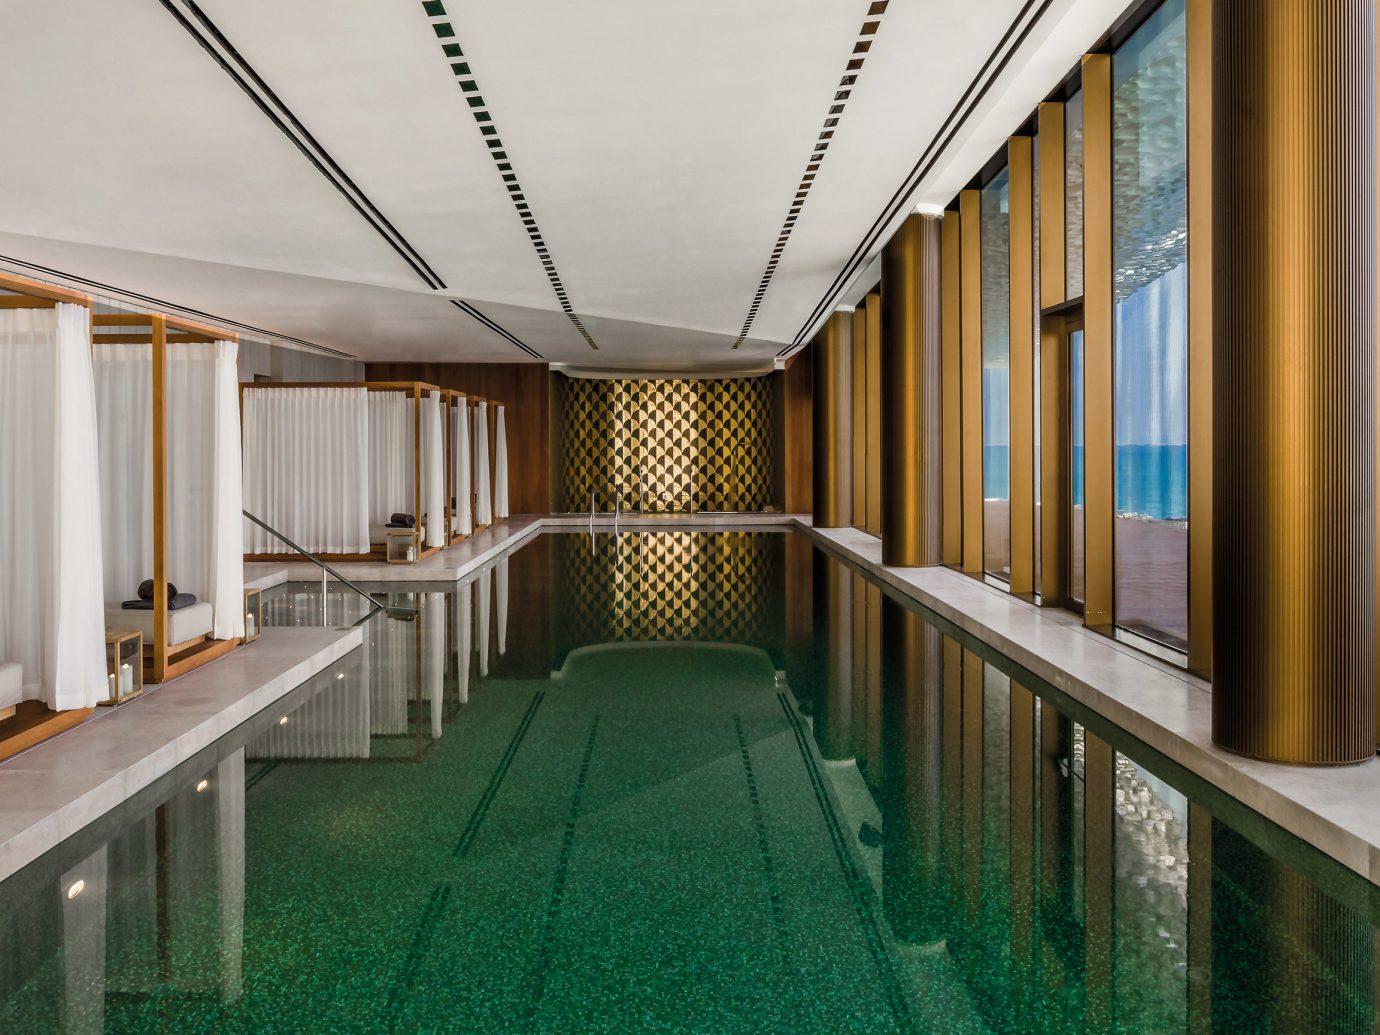 Dubai Hotels Luxury Travel Middle East indoor floor interior design real estate apartment long